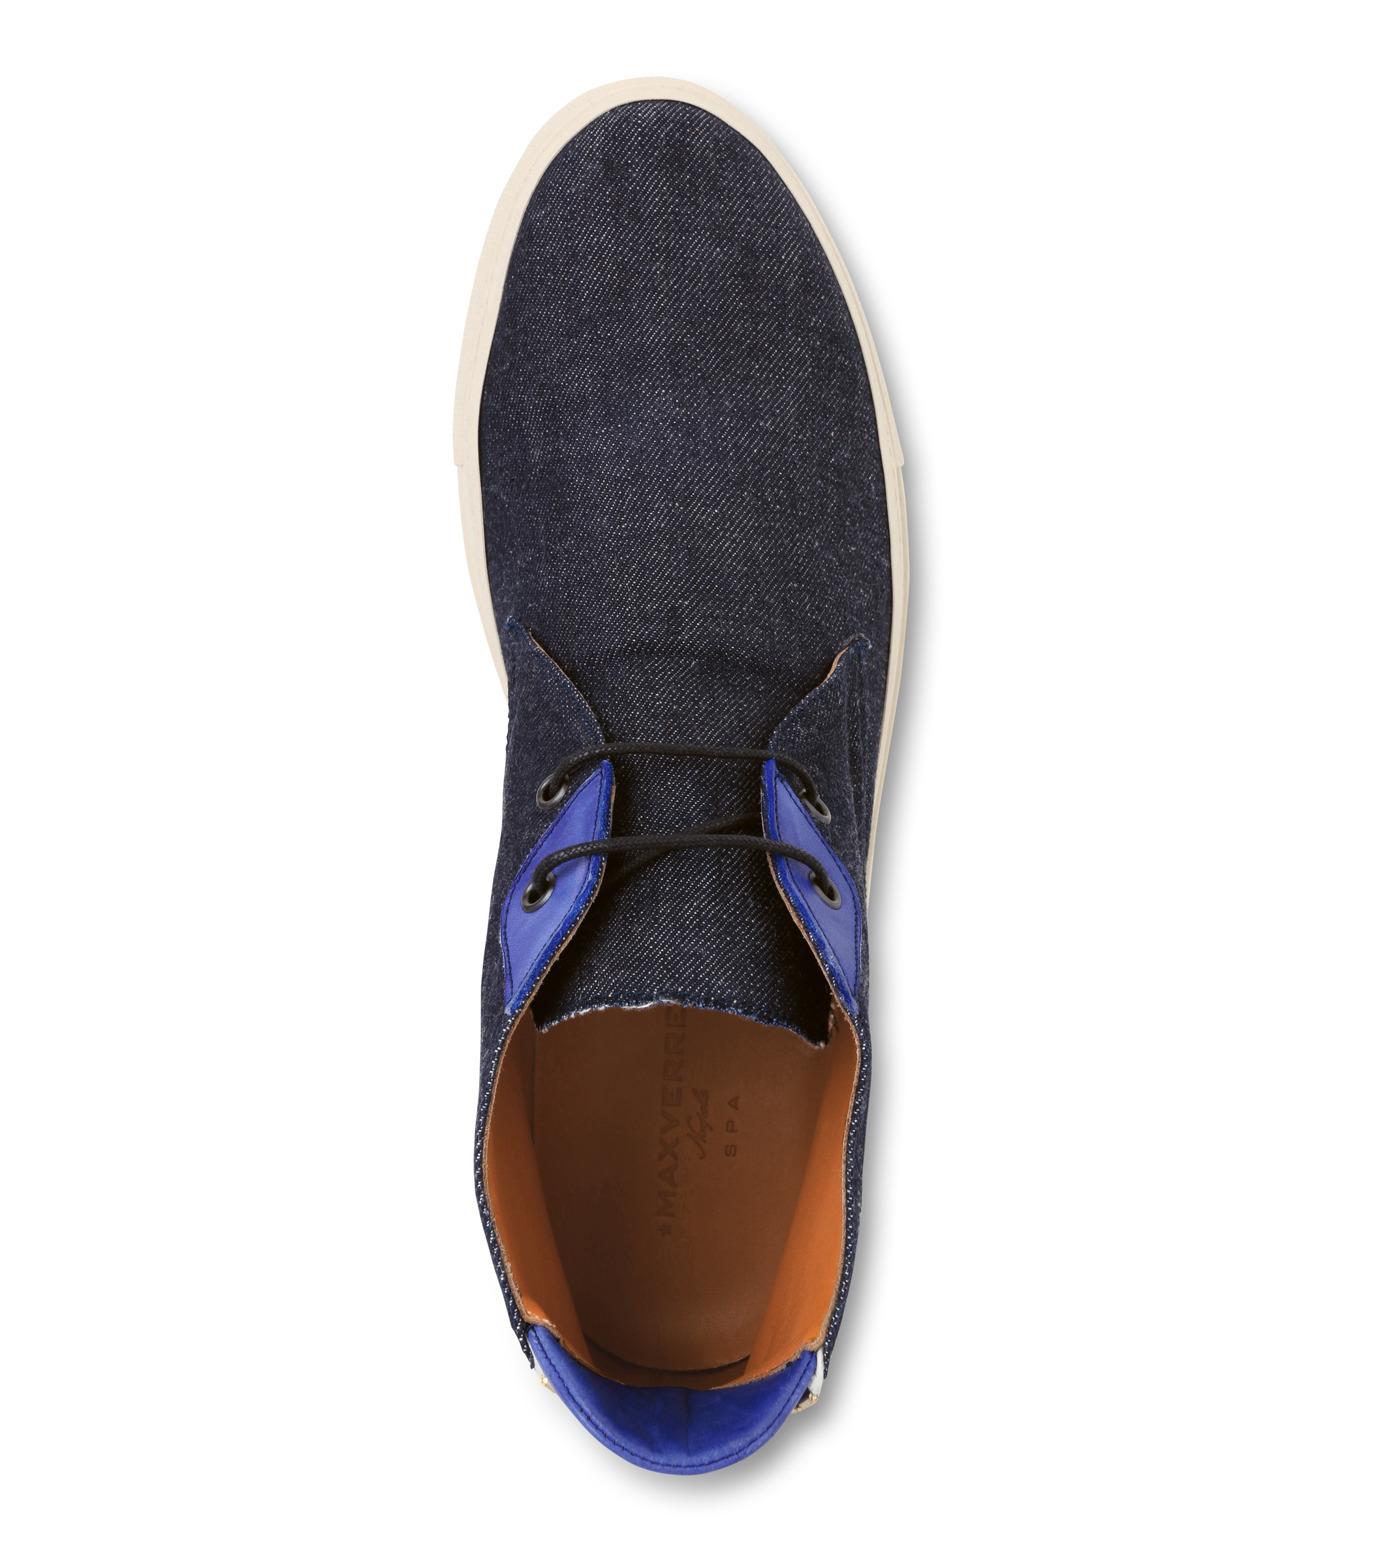 Max Verre(マックス ヴェッレ)のDenim chucker Boots-INDIGO(シューズ/shoes)-MV1003-94 拡大詳細画像4